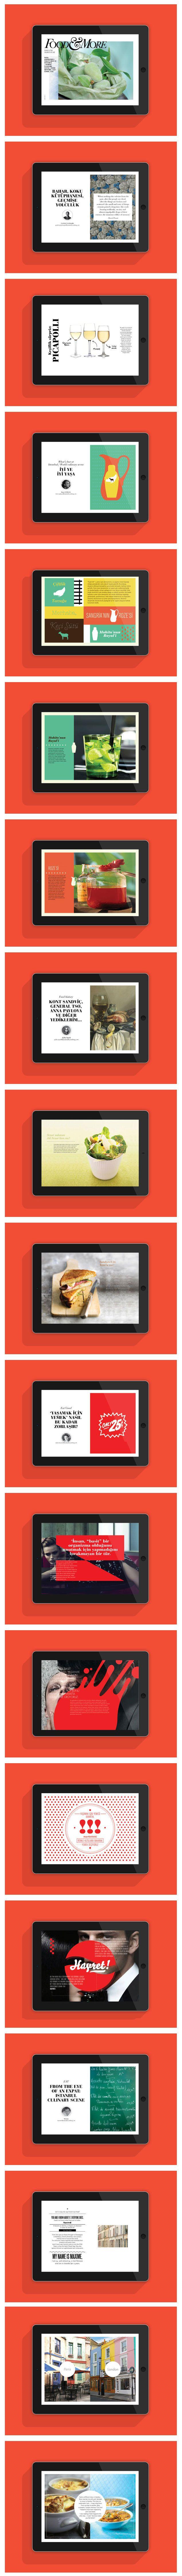 eb7d140d3b5b99ea758dd926c45aae87 mobile ui design app design